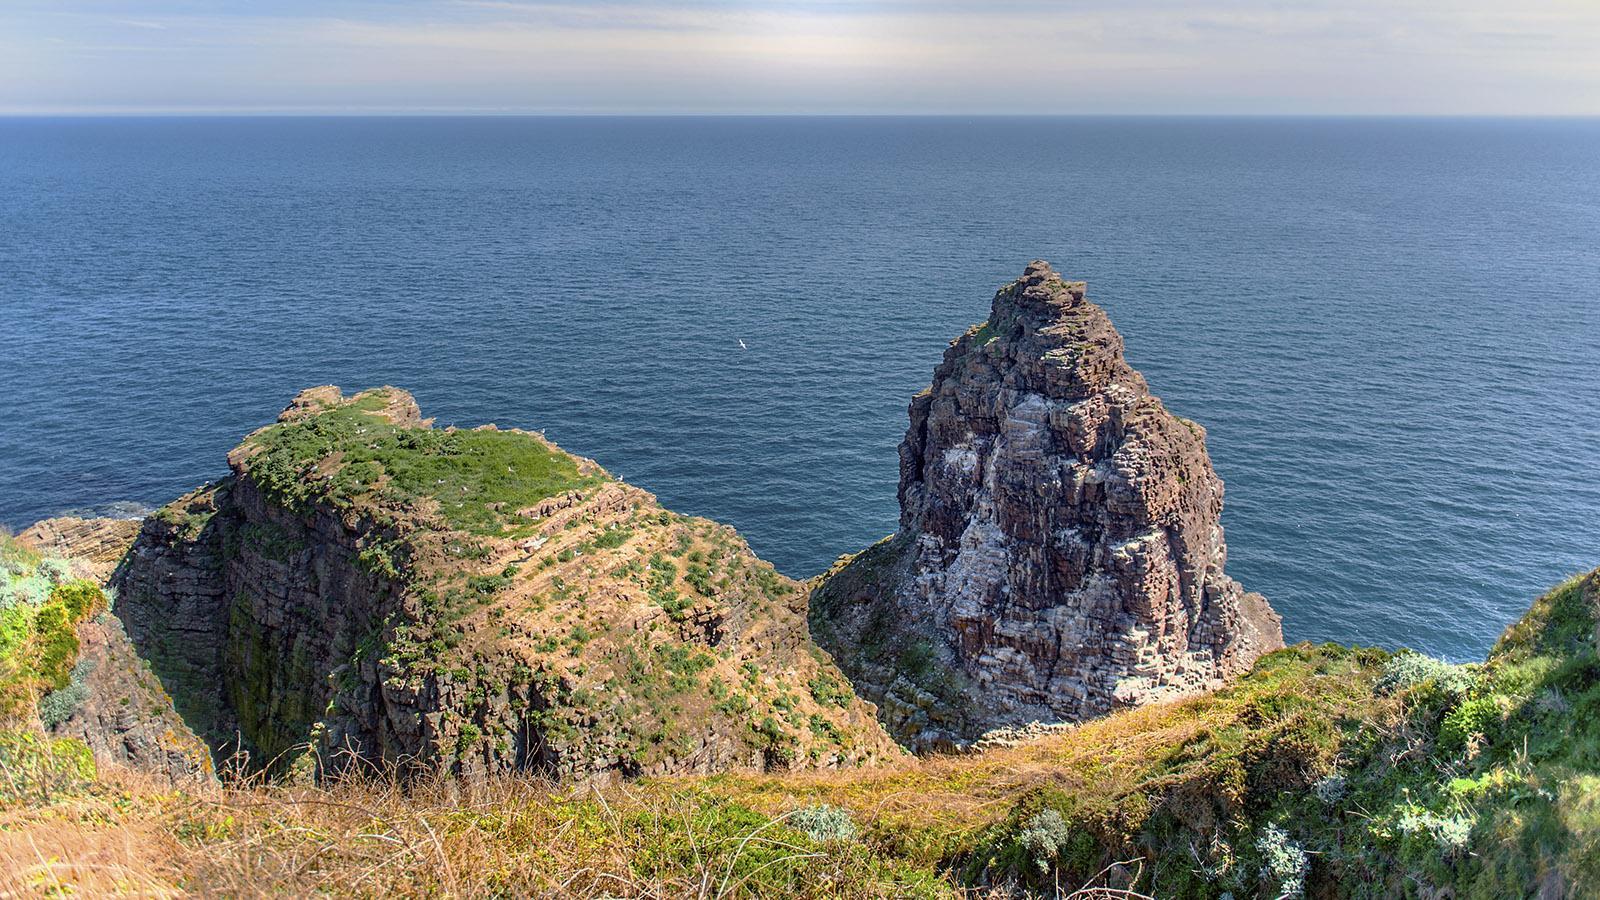 Die GR 34 folgt der Küste der Bretagne auch am Cap Fréhel. Foto: Hilke Maunder